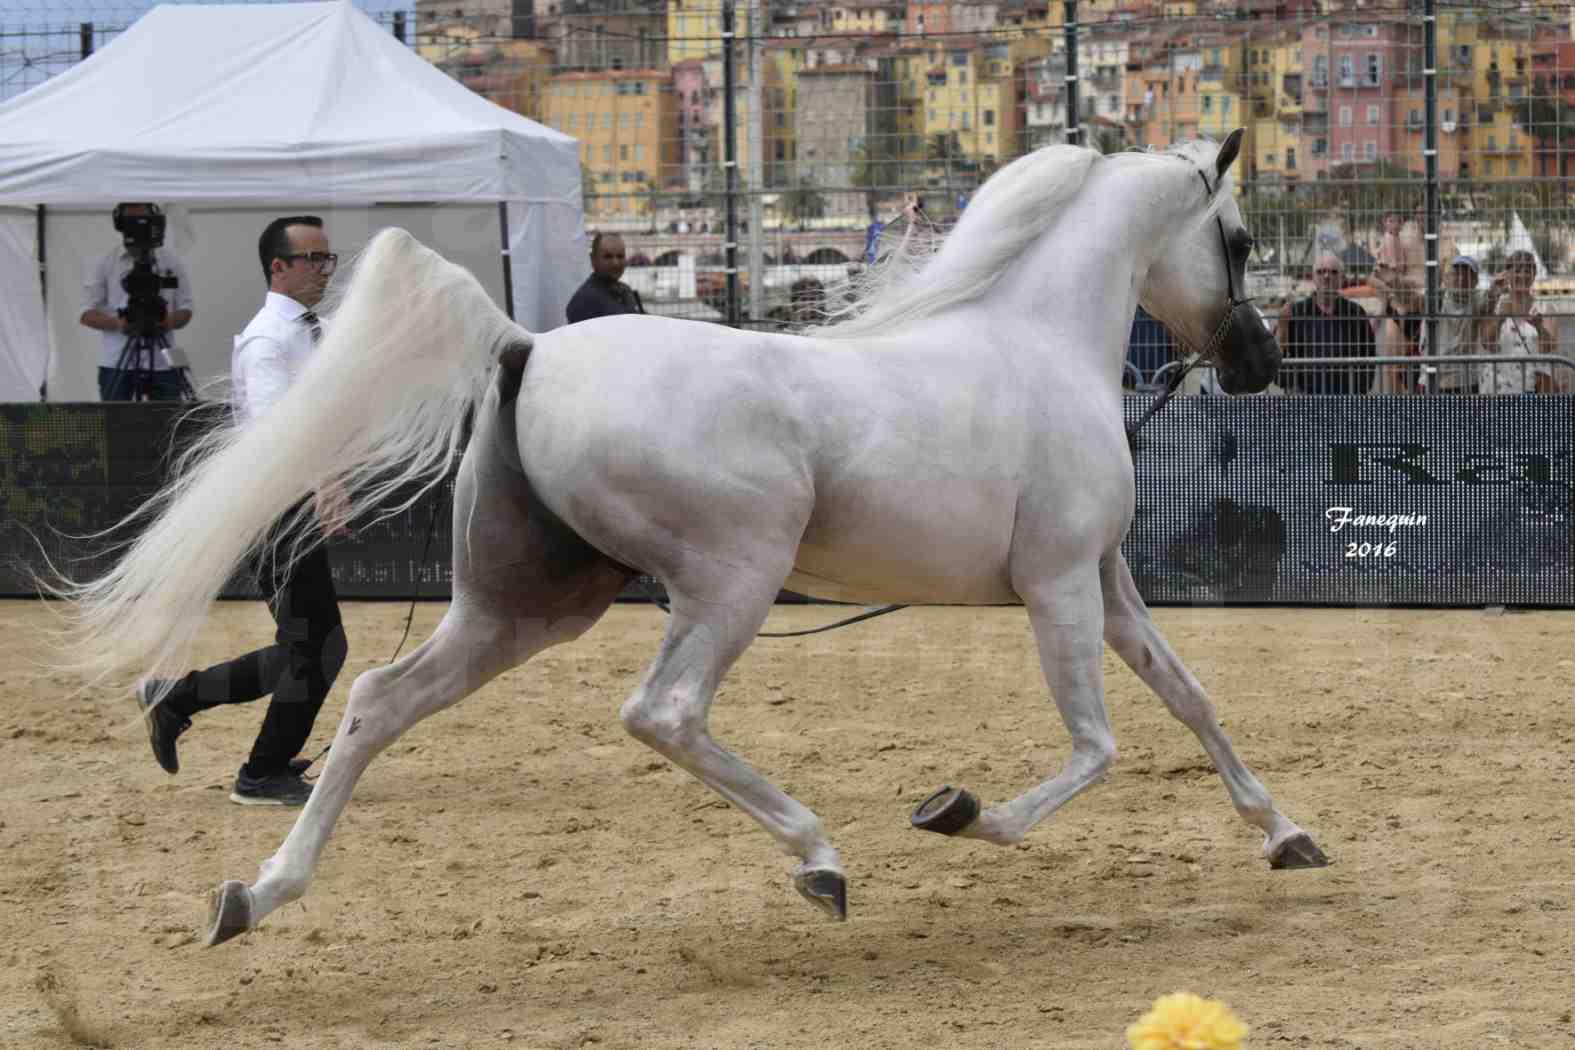 Show International de chevaux ARABES de MENTON 2016 - AJA ANGELO - 21